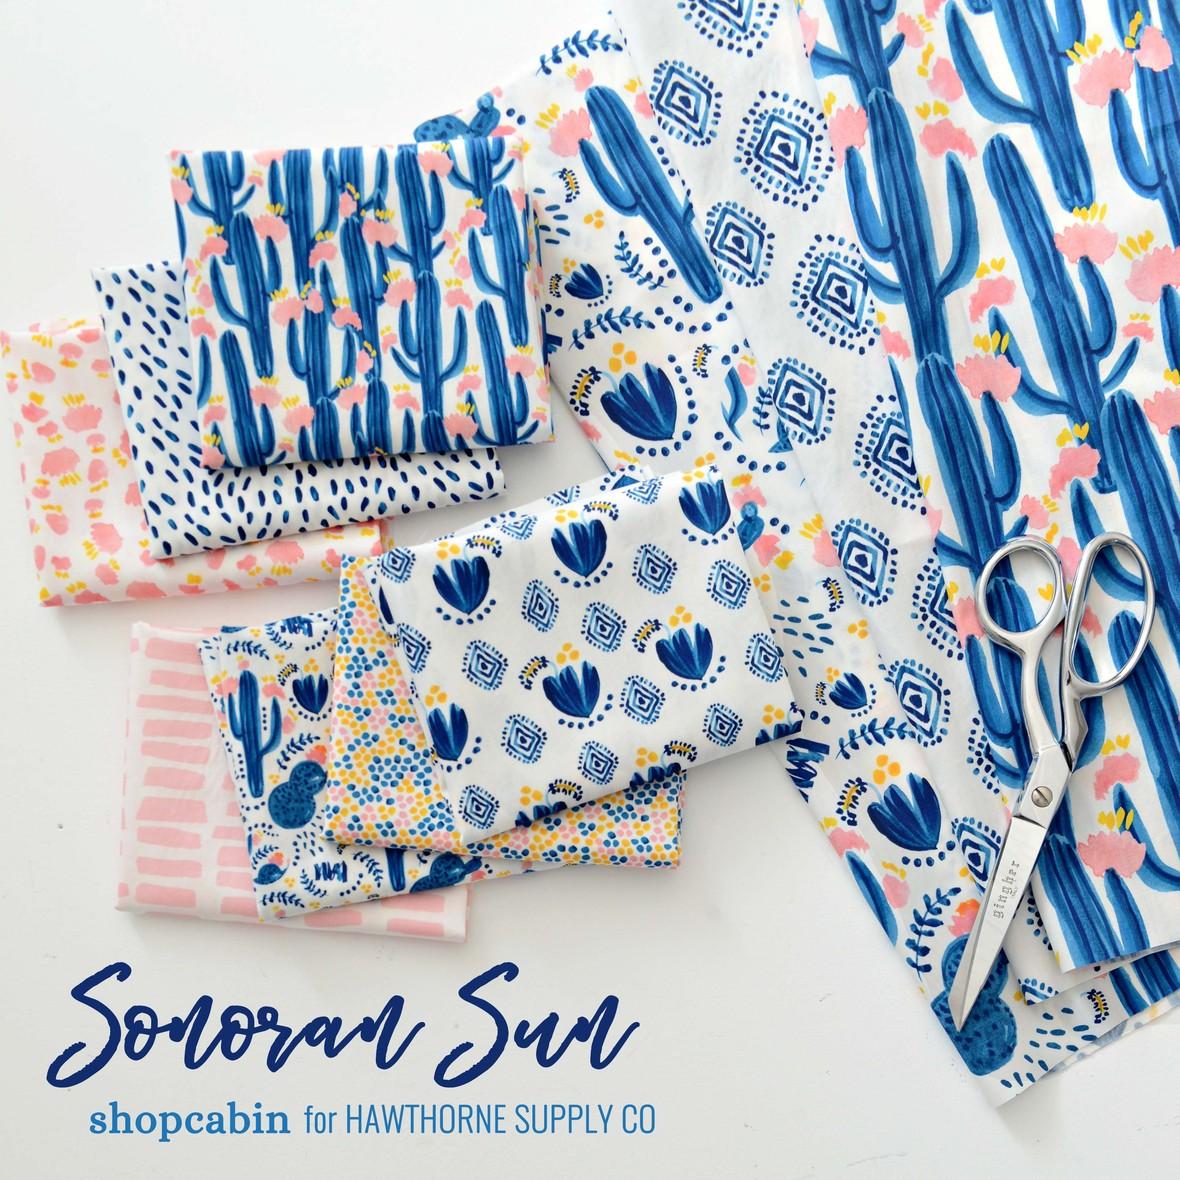 Sonoran Sun Fabric Poster Shopcabin for Hawthorne Supply Co